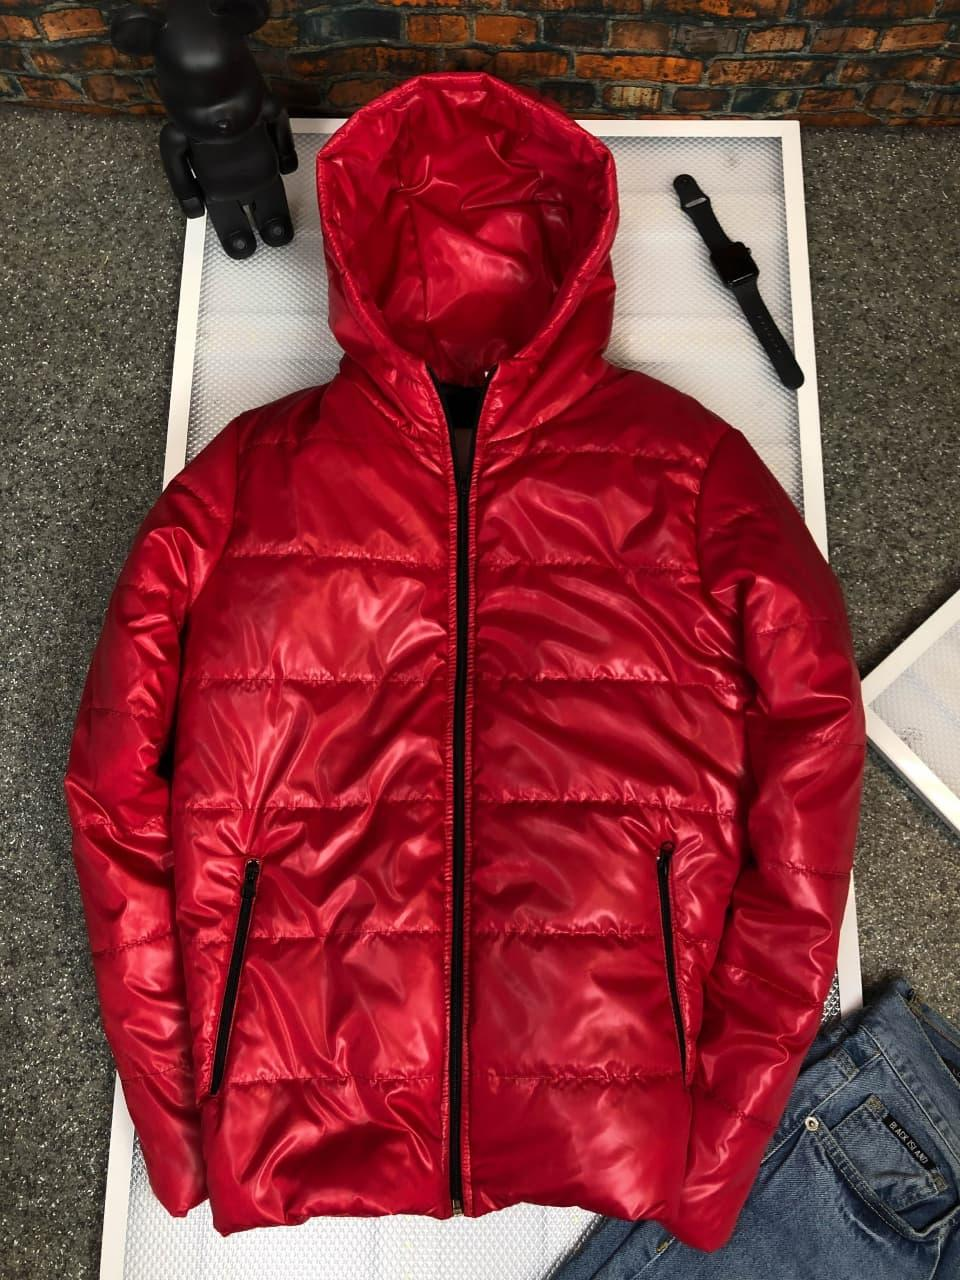 Куртка мужская красная с капюшоном теплая демисезонная глянцевая